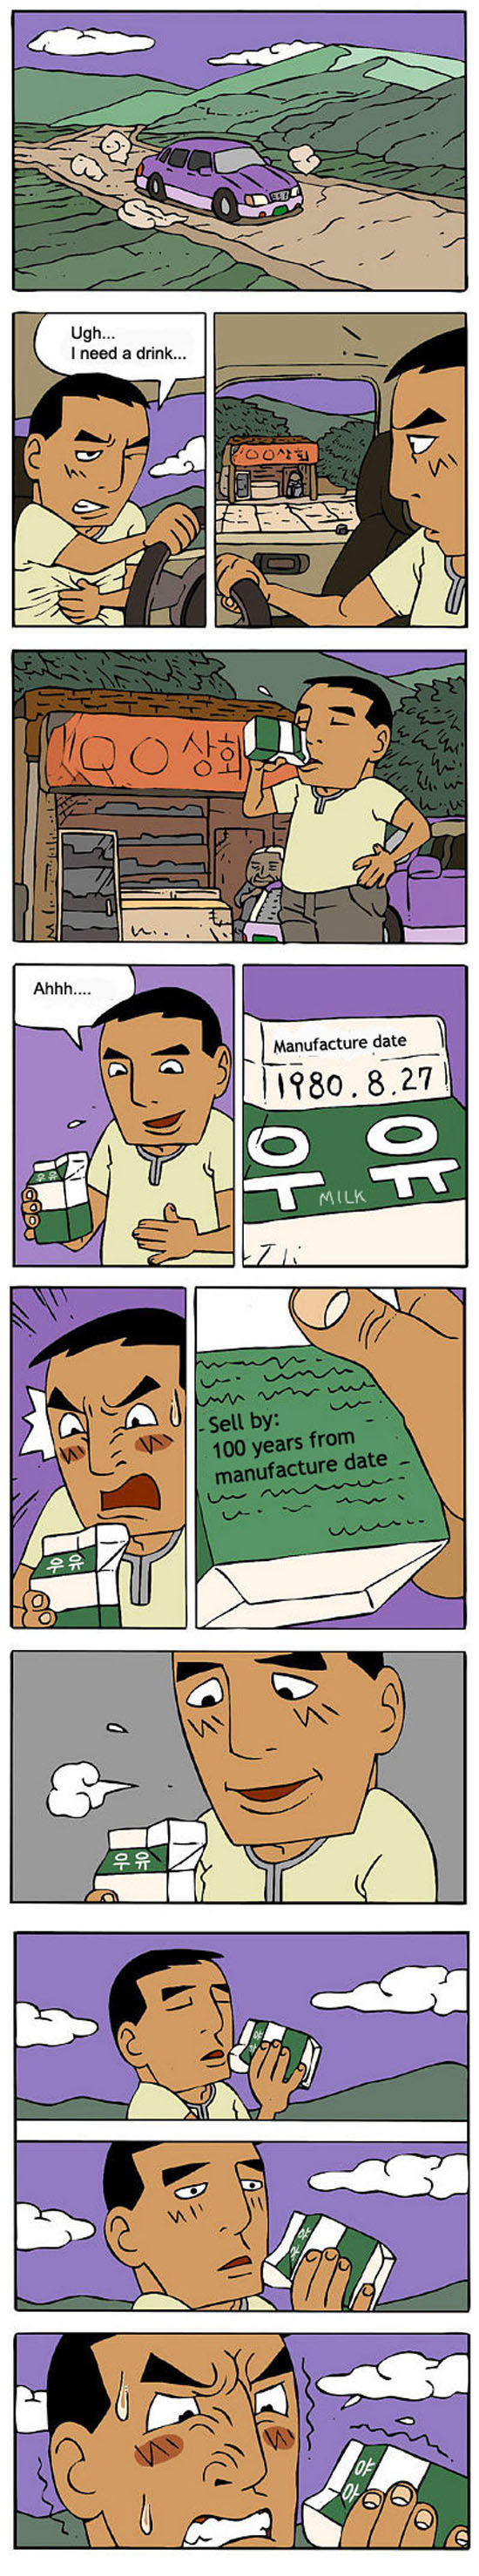 Funny Korean Comic Strips Part 2 14 Pics - Izismilecom-5013